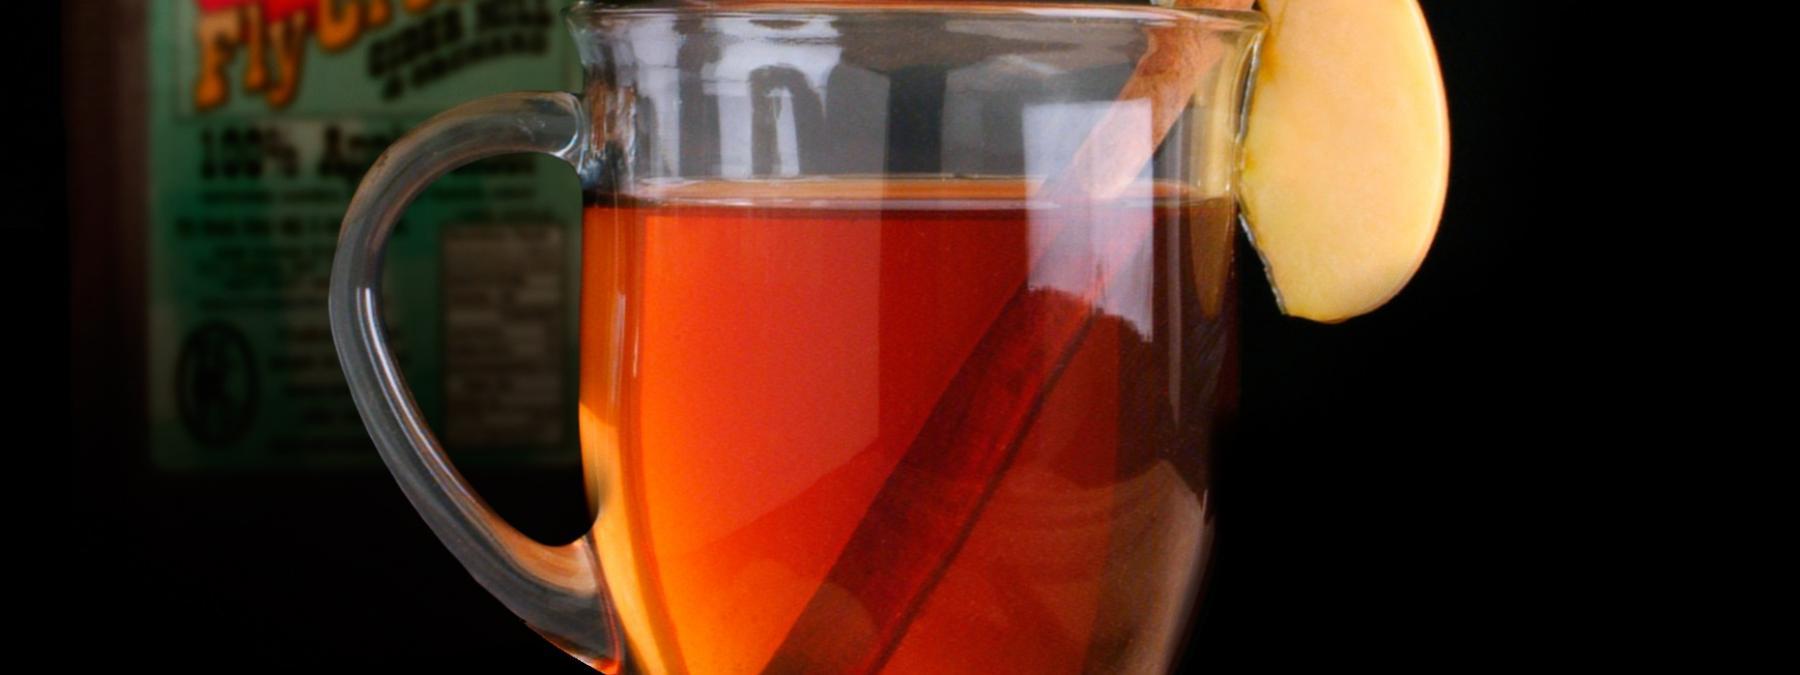 Cider & Mulling Spices